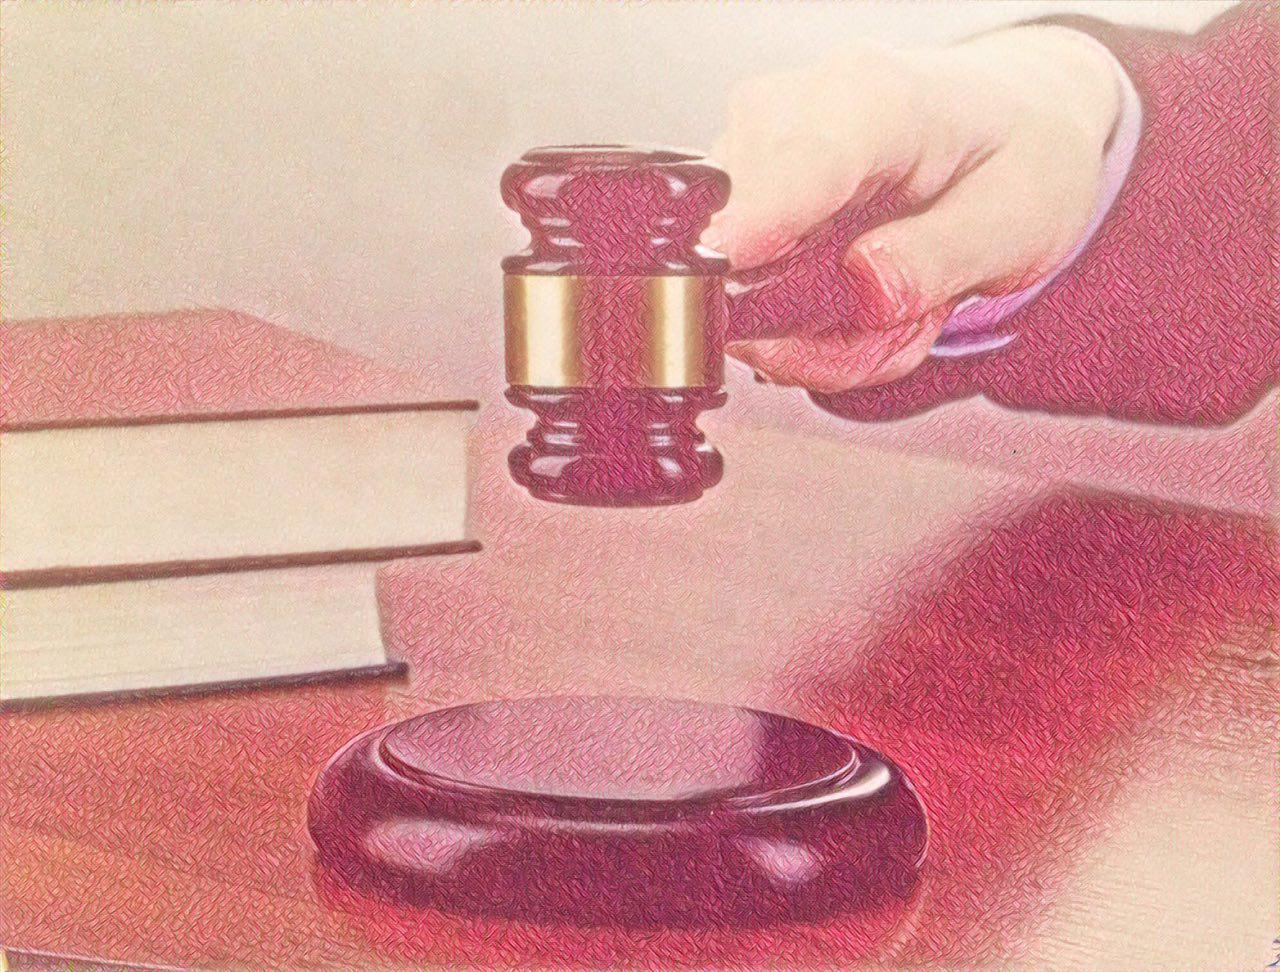 مشاوره رایگان حقوقی